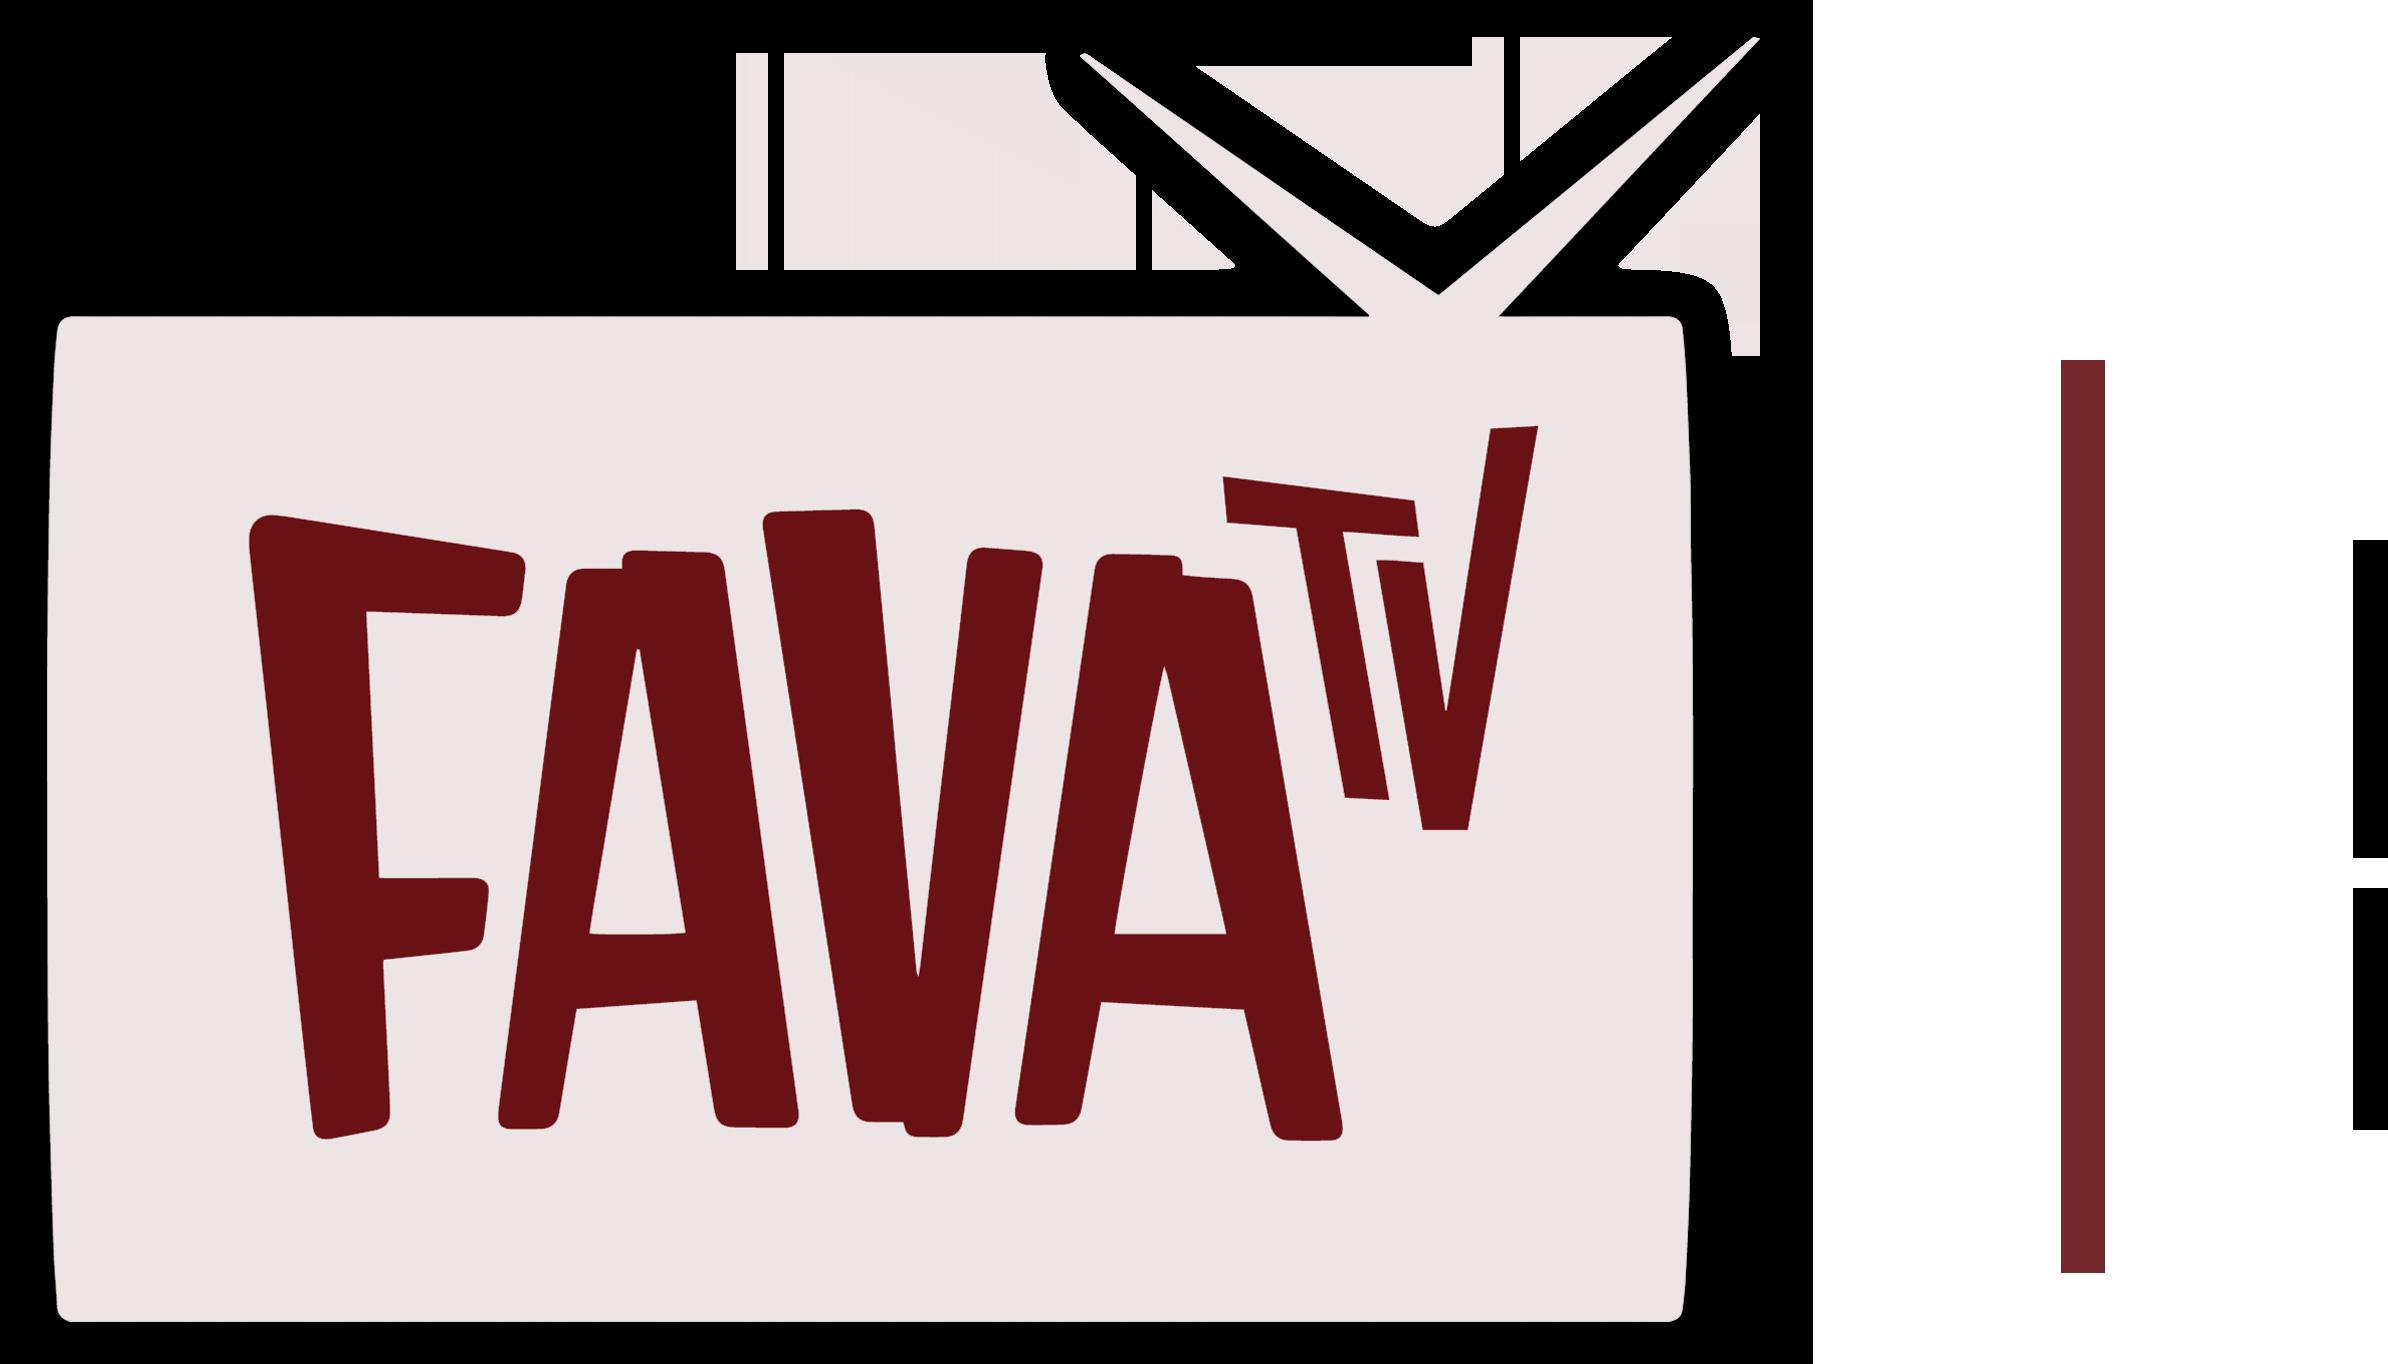 favatv logo